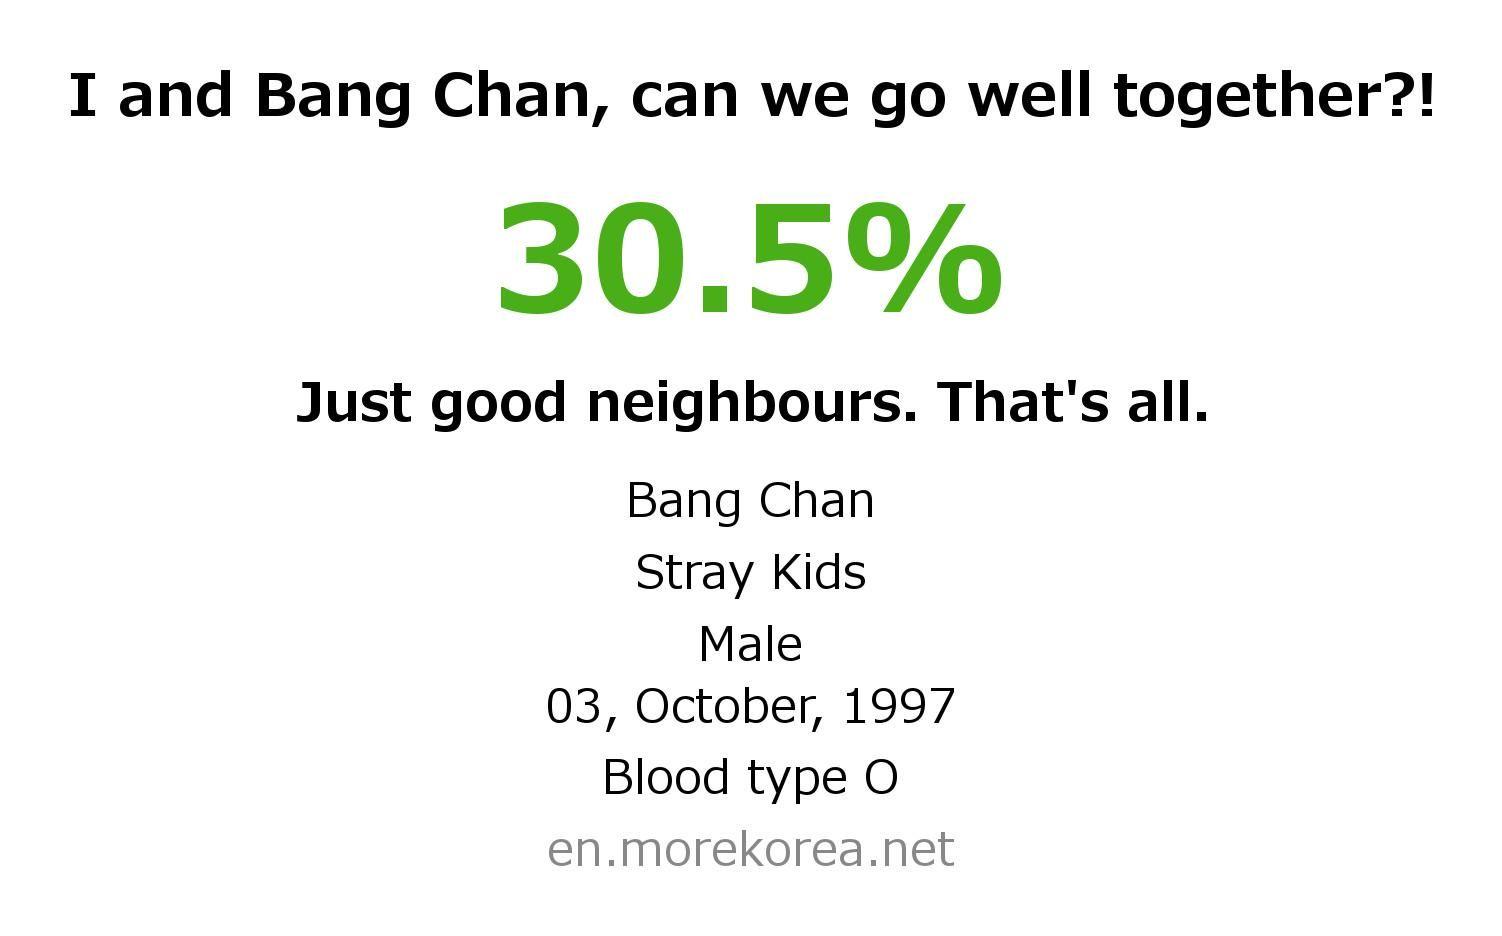 Kpop Idols Matching Fortune Check Stray Kids Kpop Idol Idol Kpop